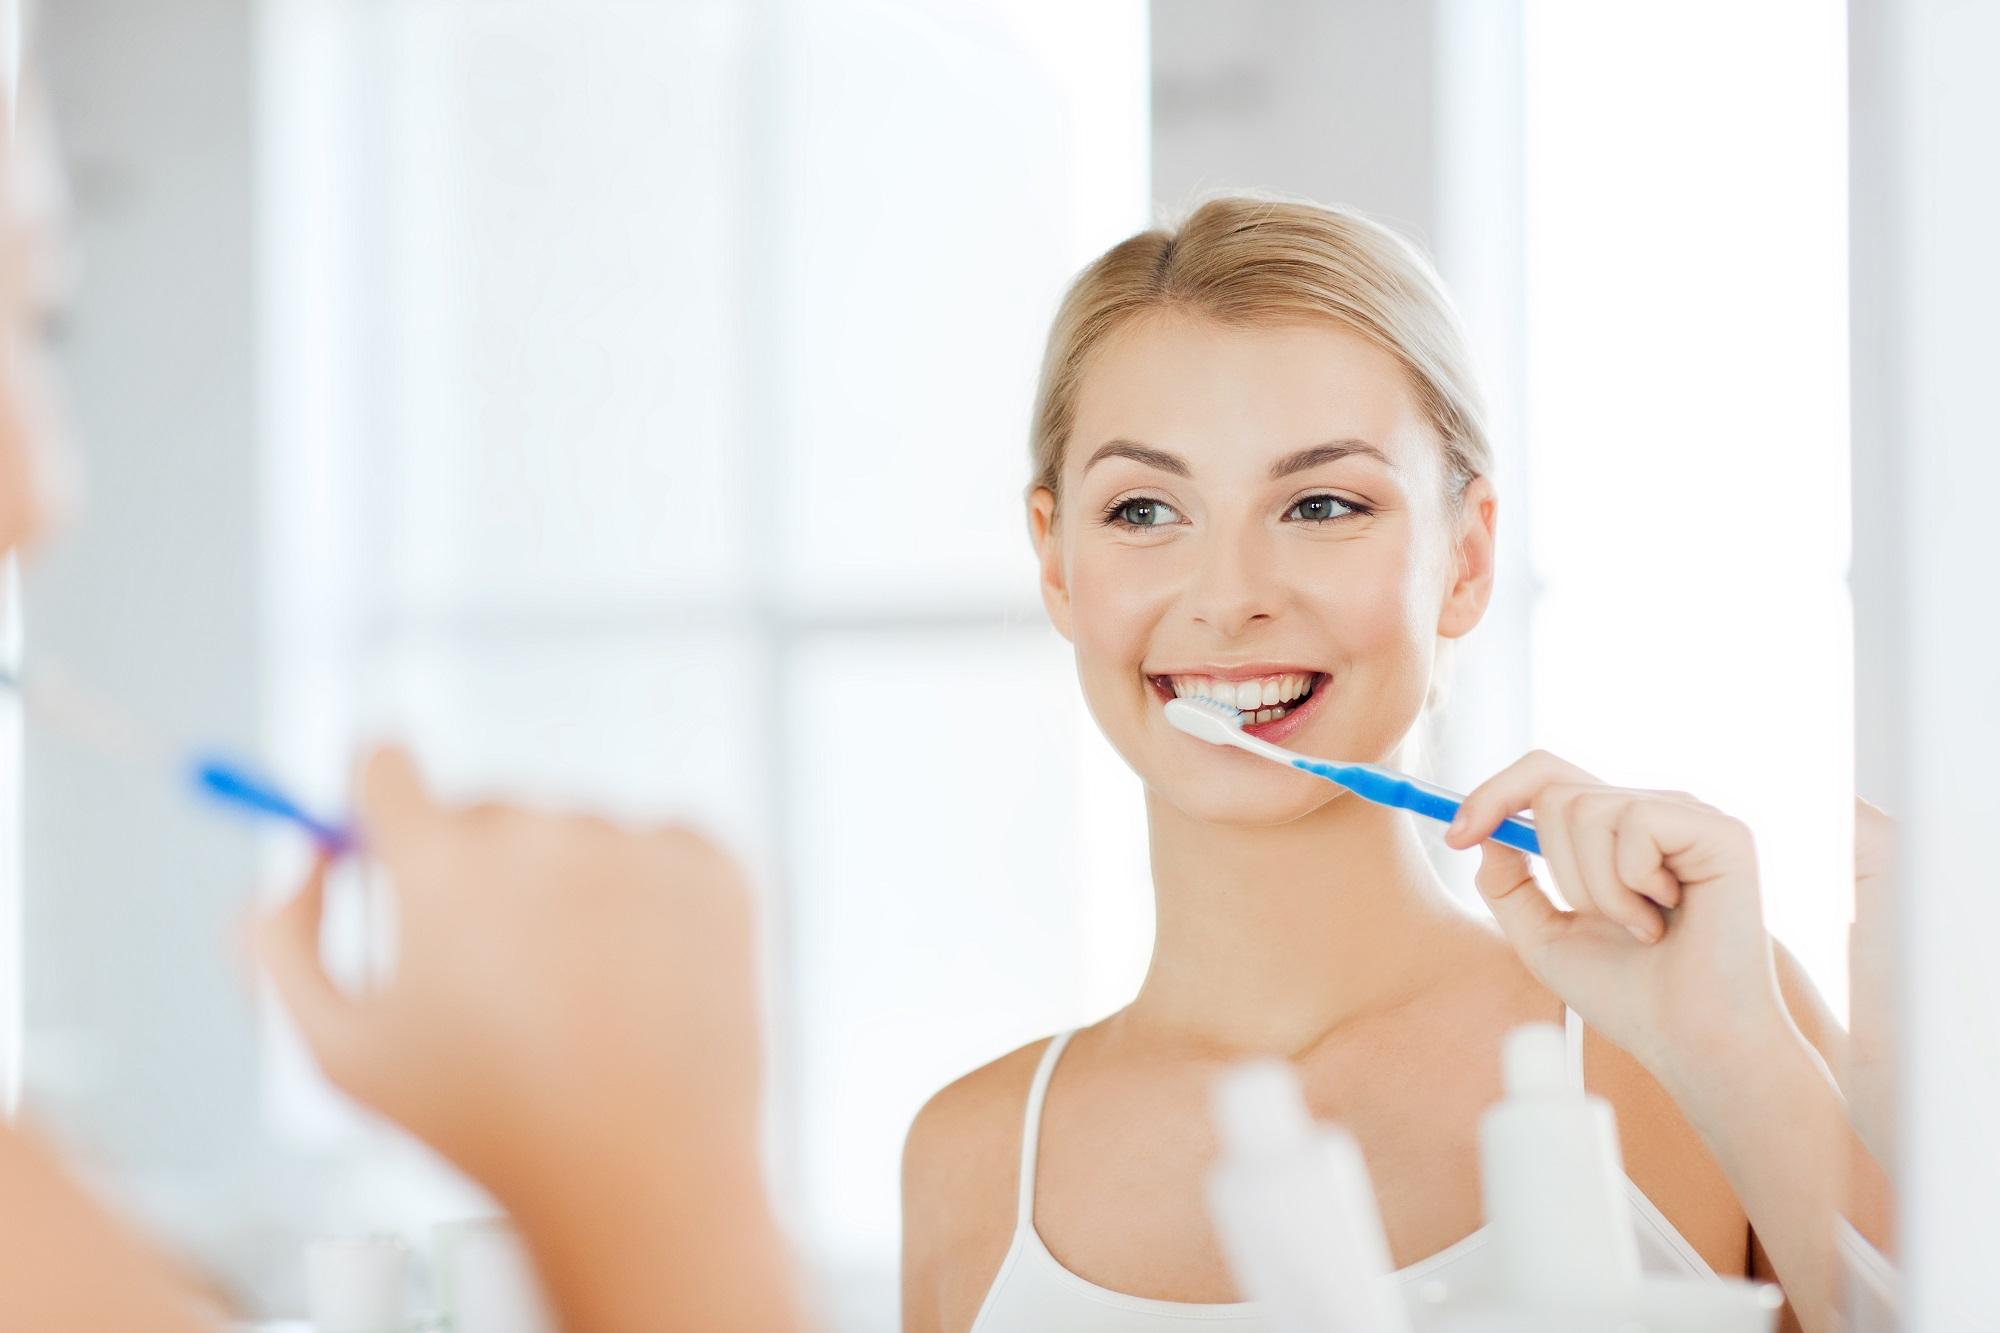 Implant Dentist Houston | Taking Care of Dental Implants